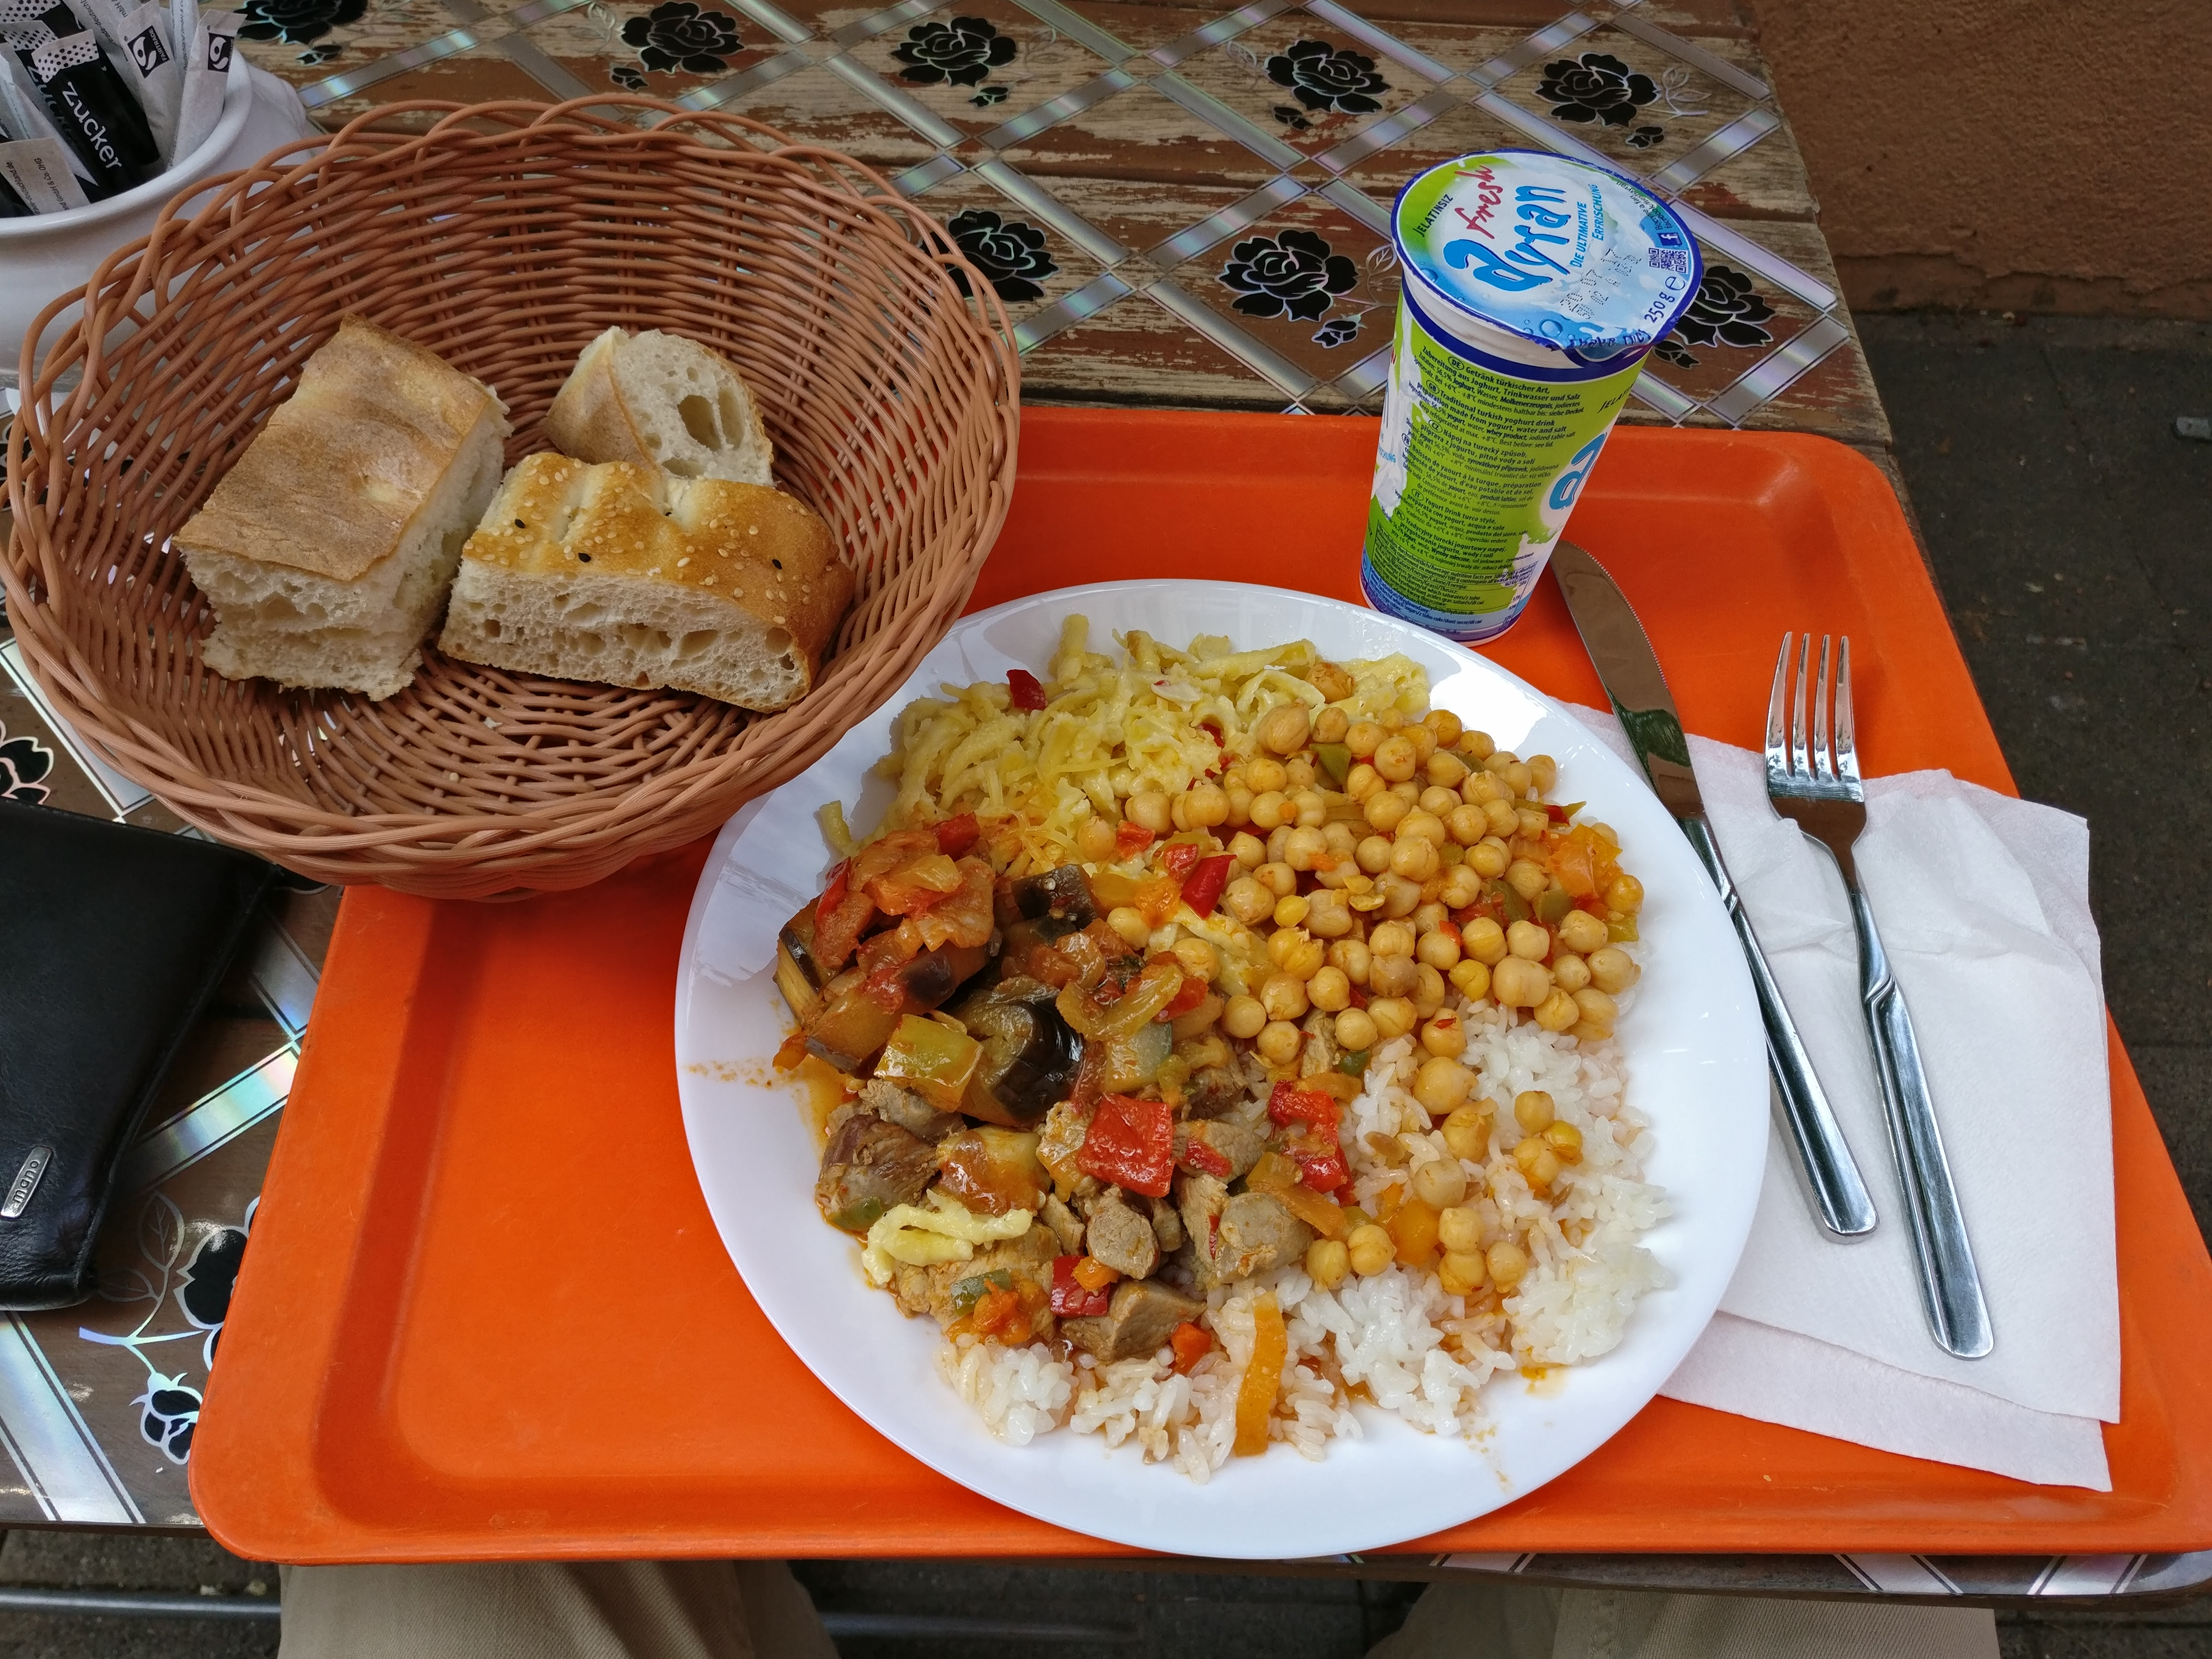 http://foodloader.net/nico_2017-06-02_reis-fleisch-nudeln-gemuese-kichererbsen-brot.jpg